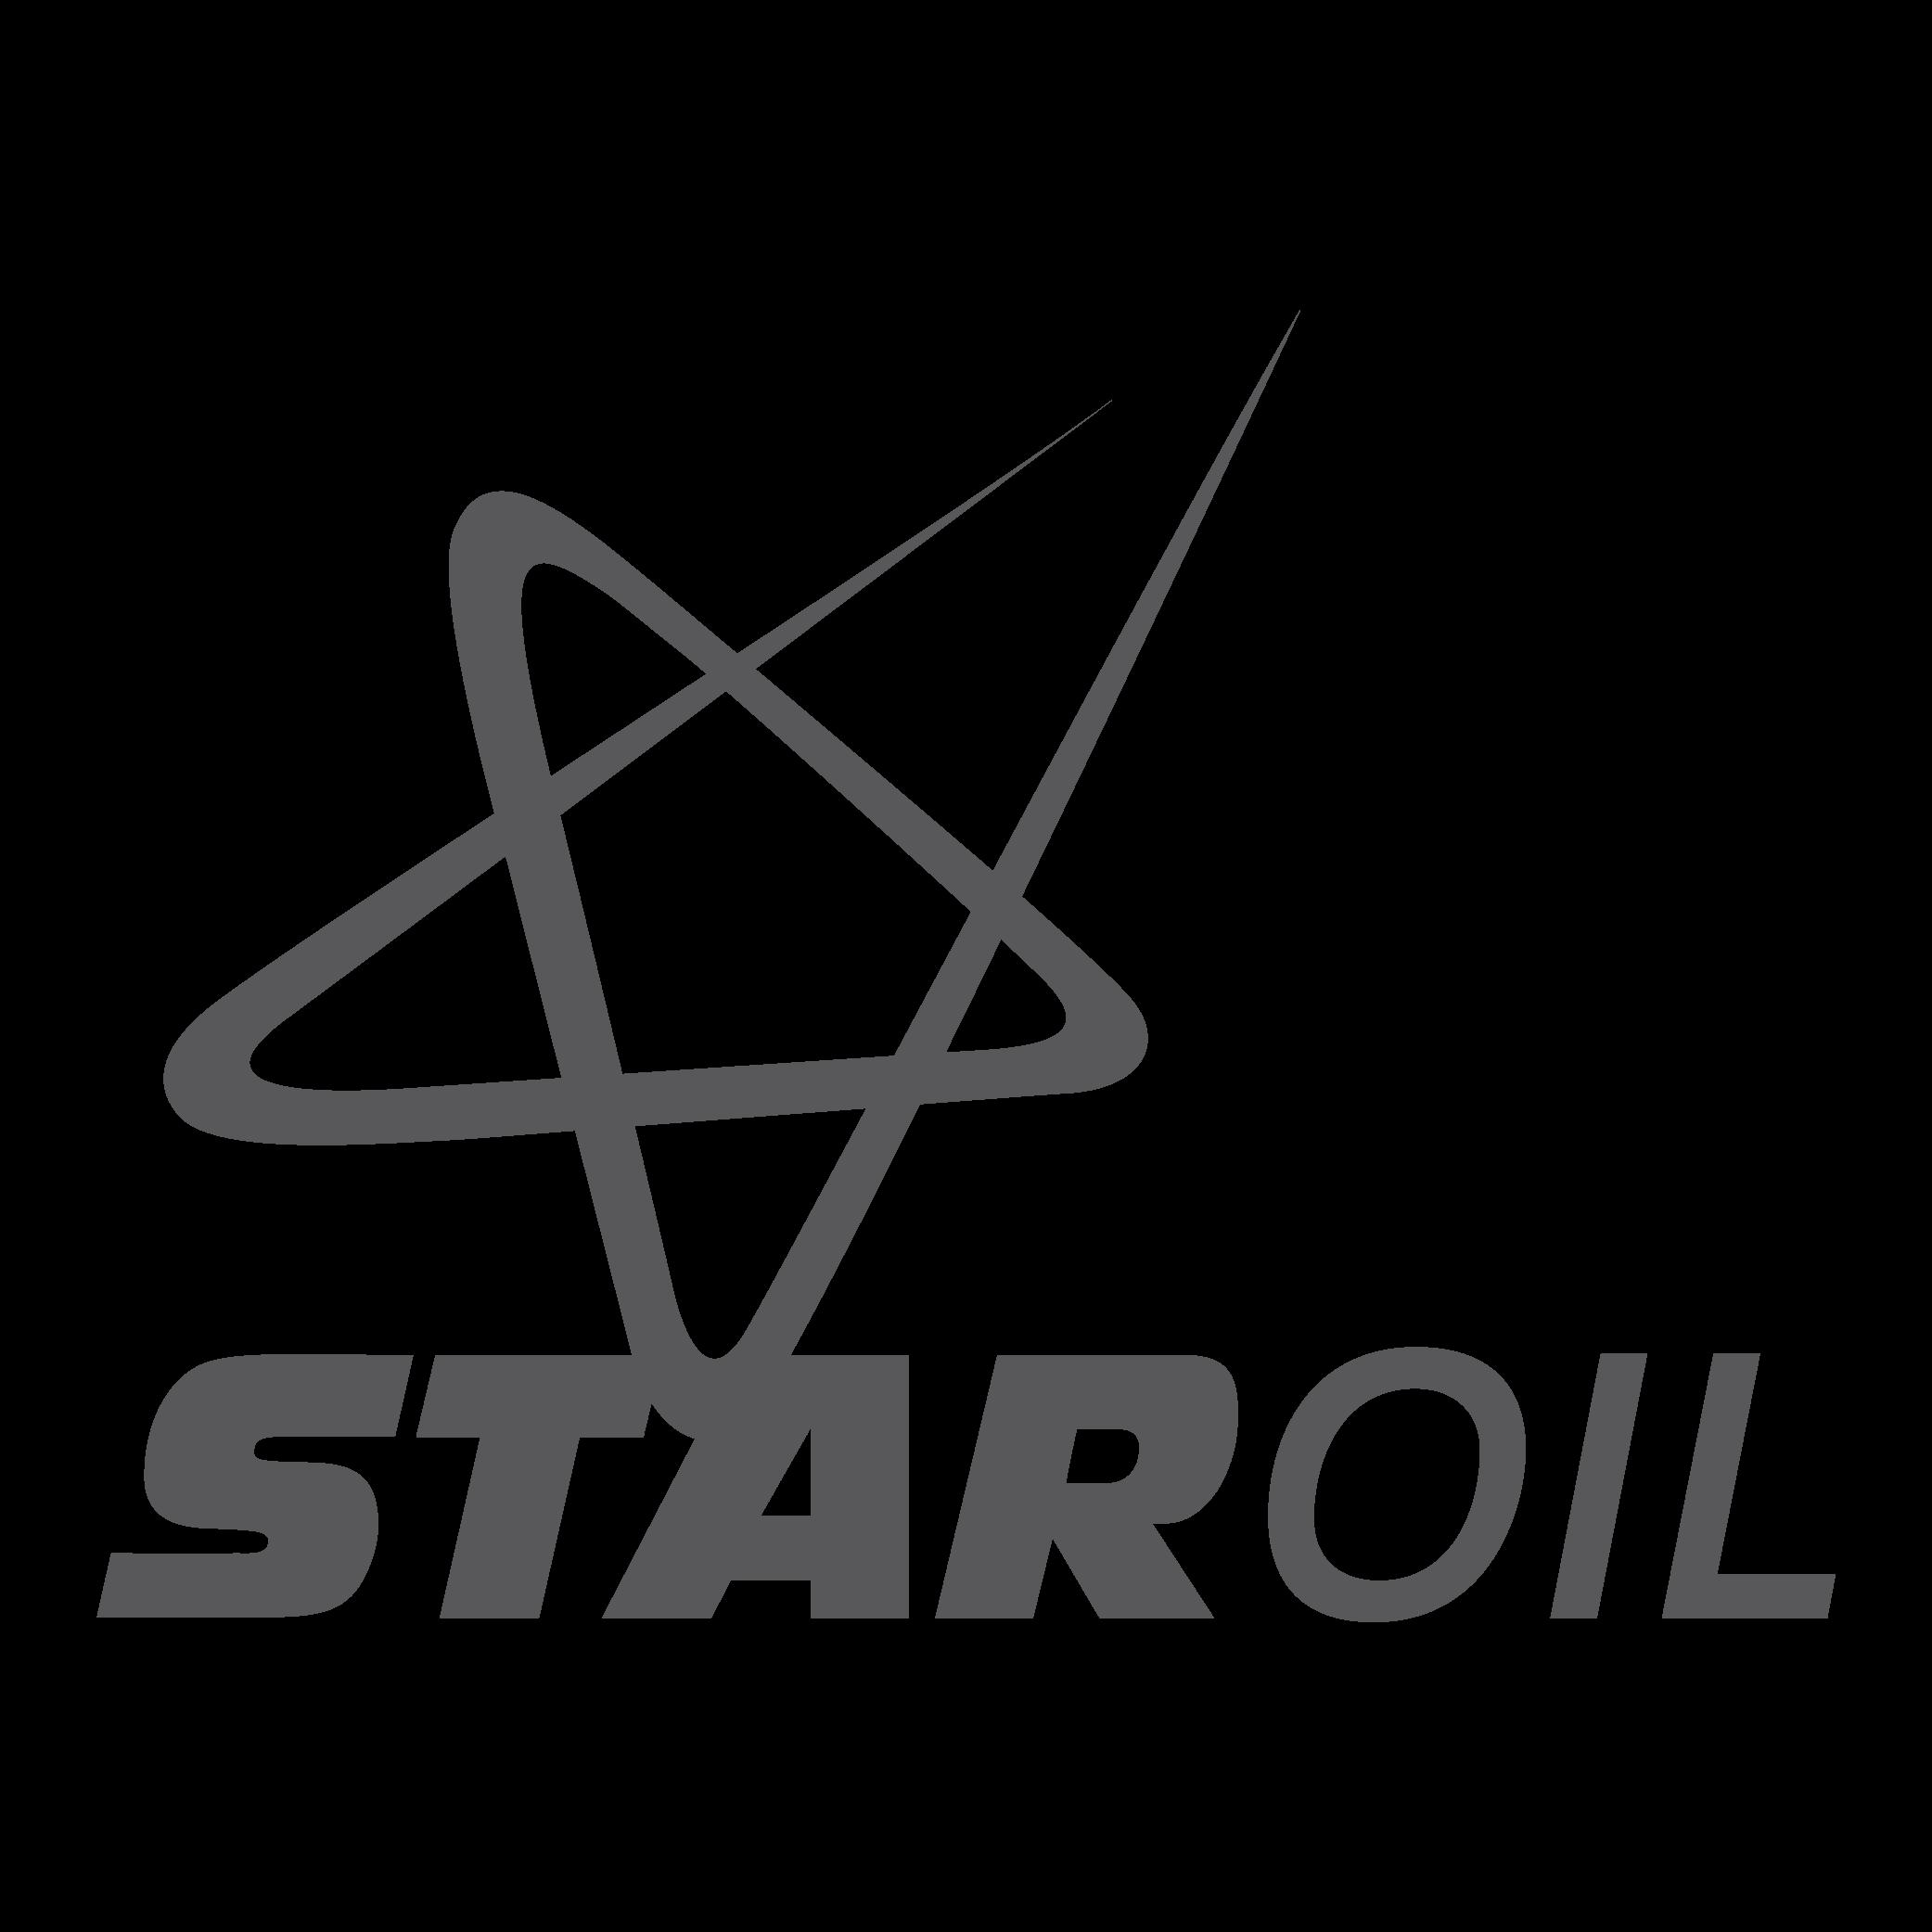 Staroil logo